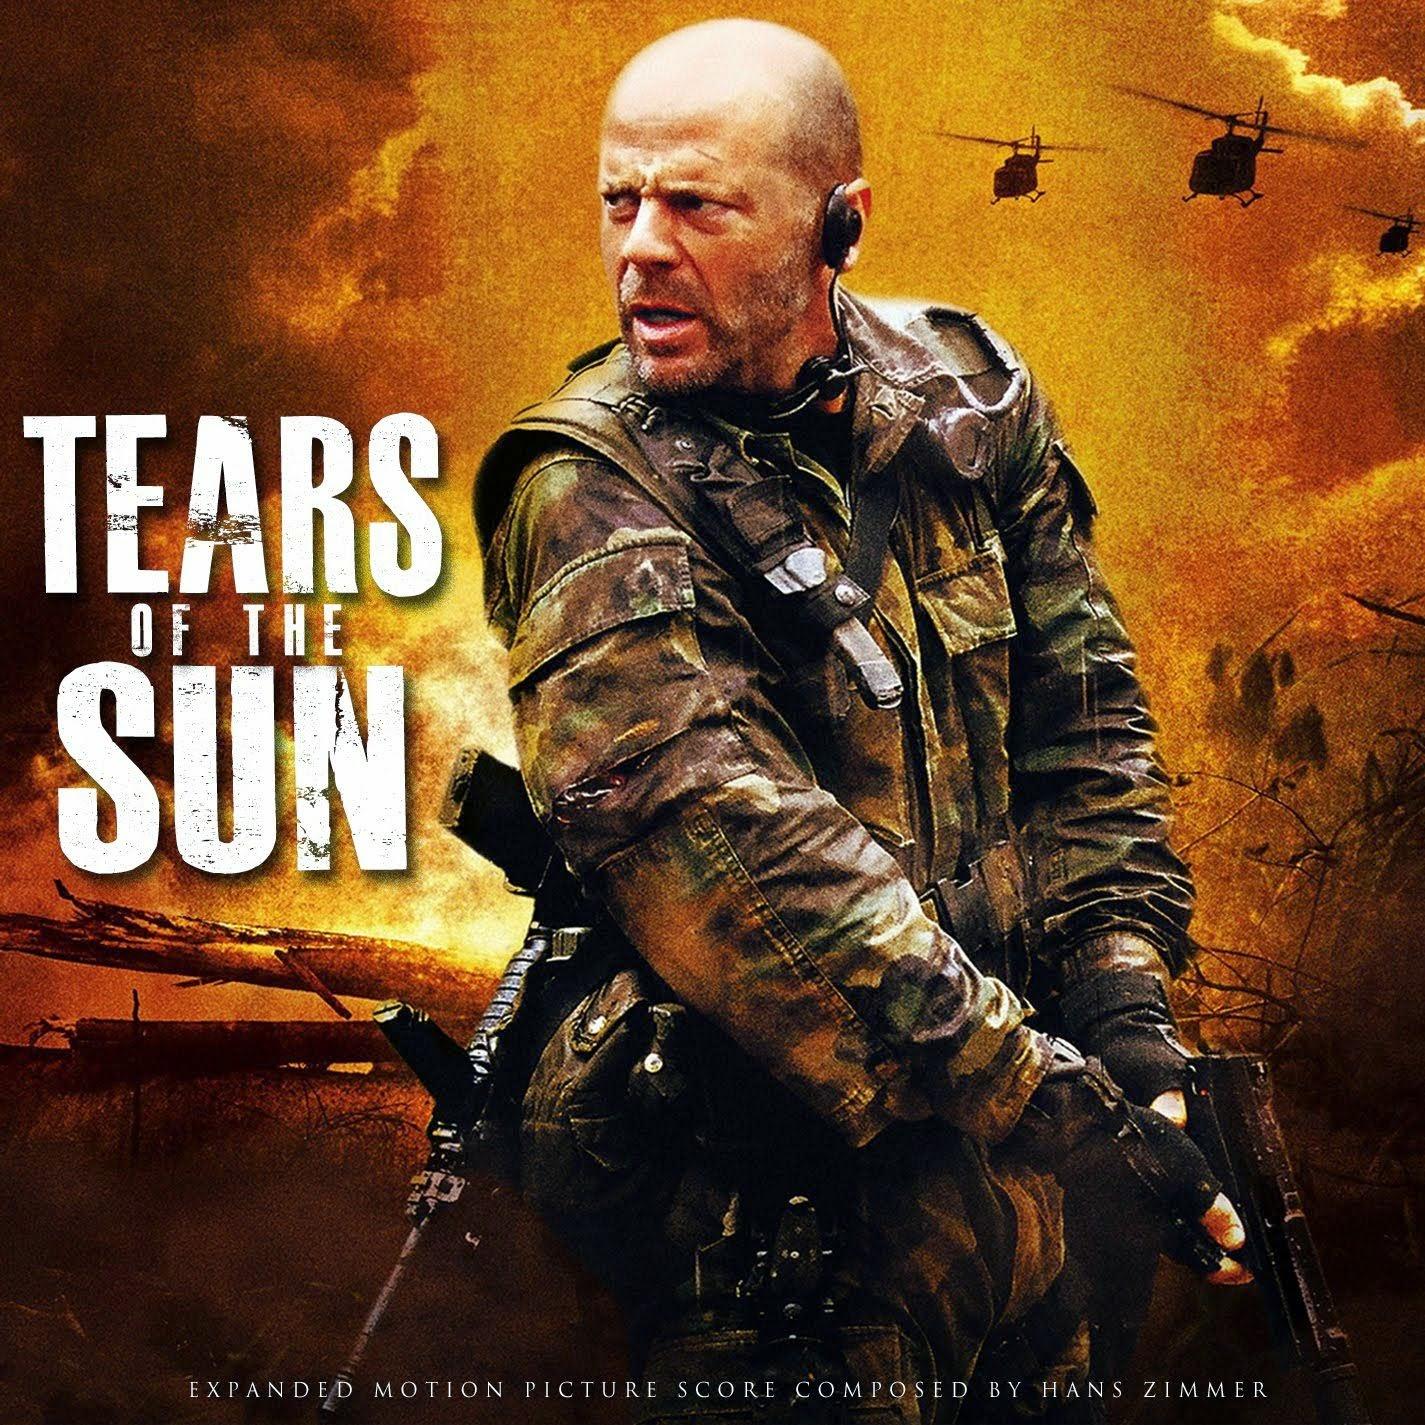 Tears of the Sun ฝ่ายุทธการสุริยะทมิฬ [HD][พากย์ไทย]